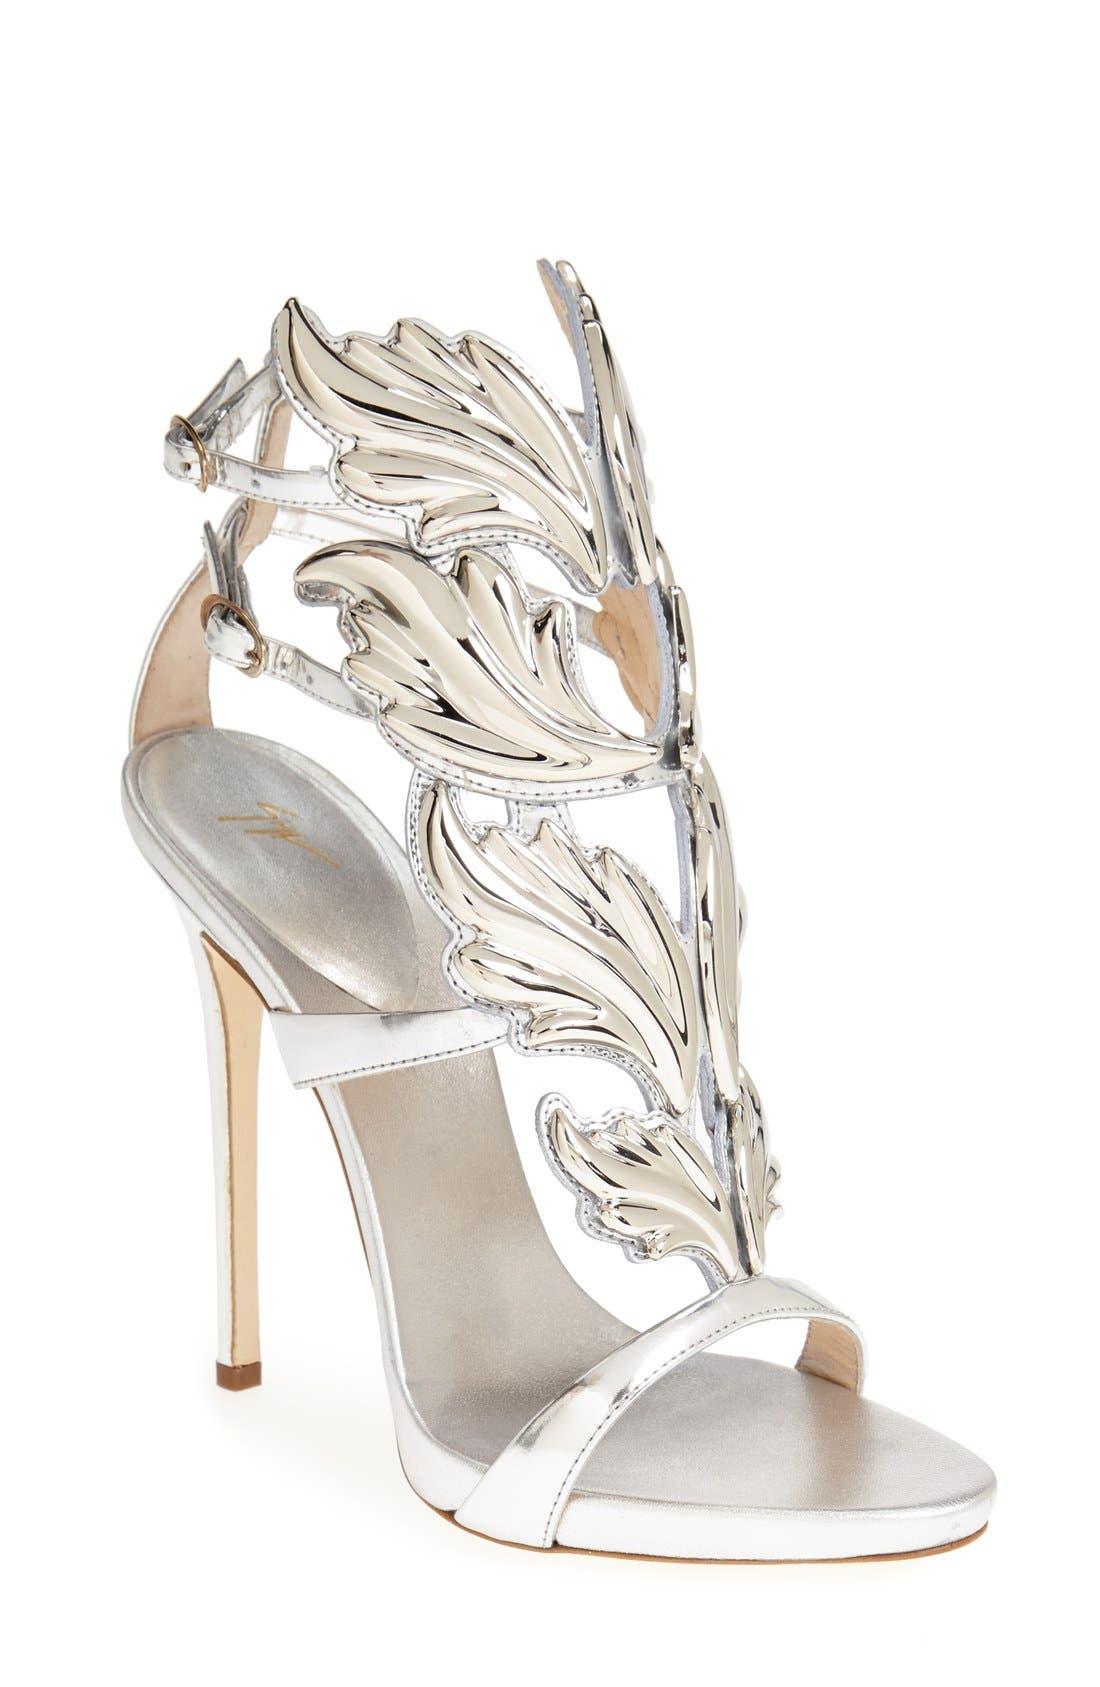 Main Image - Giuseppe Zanotti 'Coline' Winged Sandal (Women)